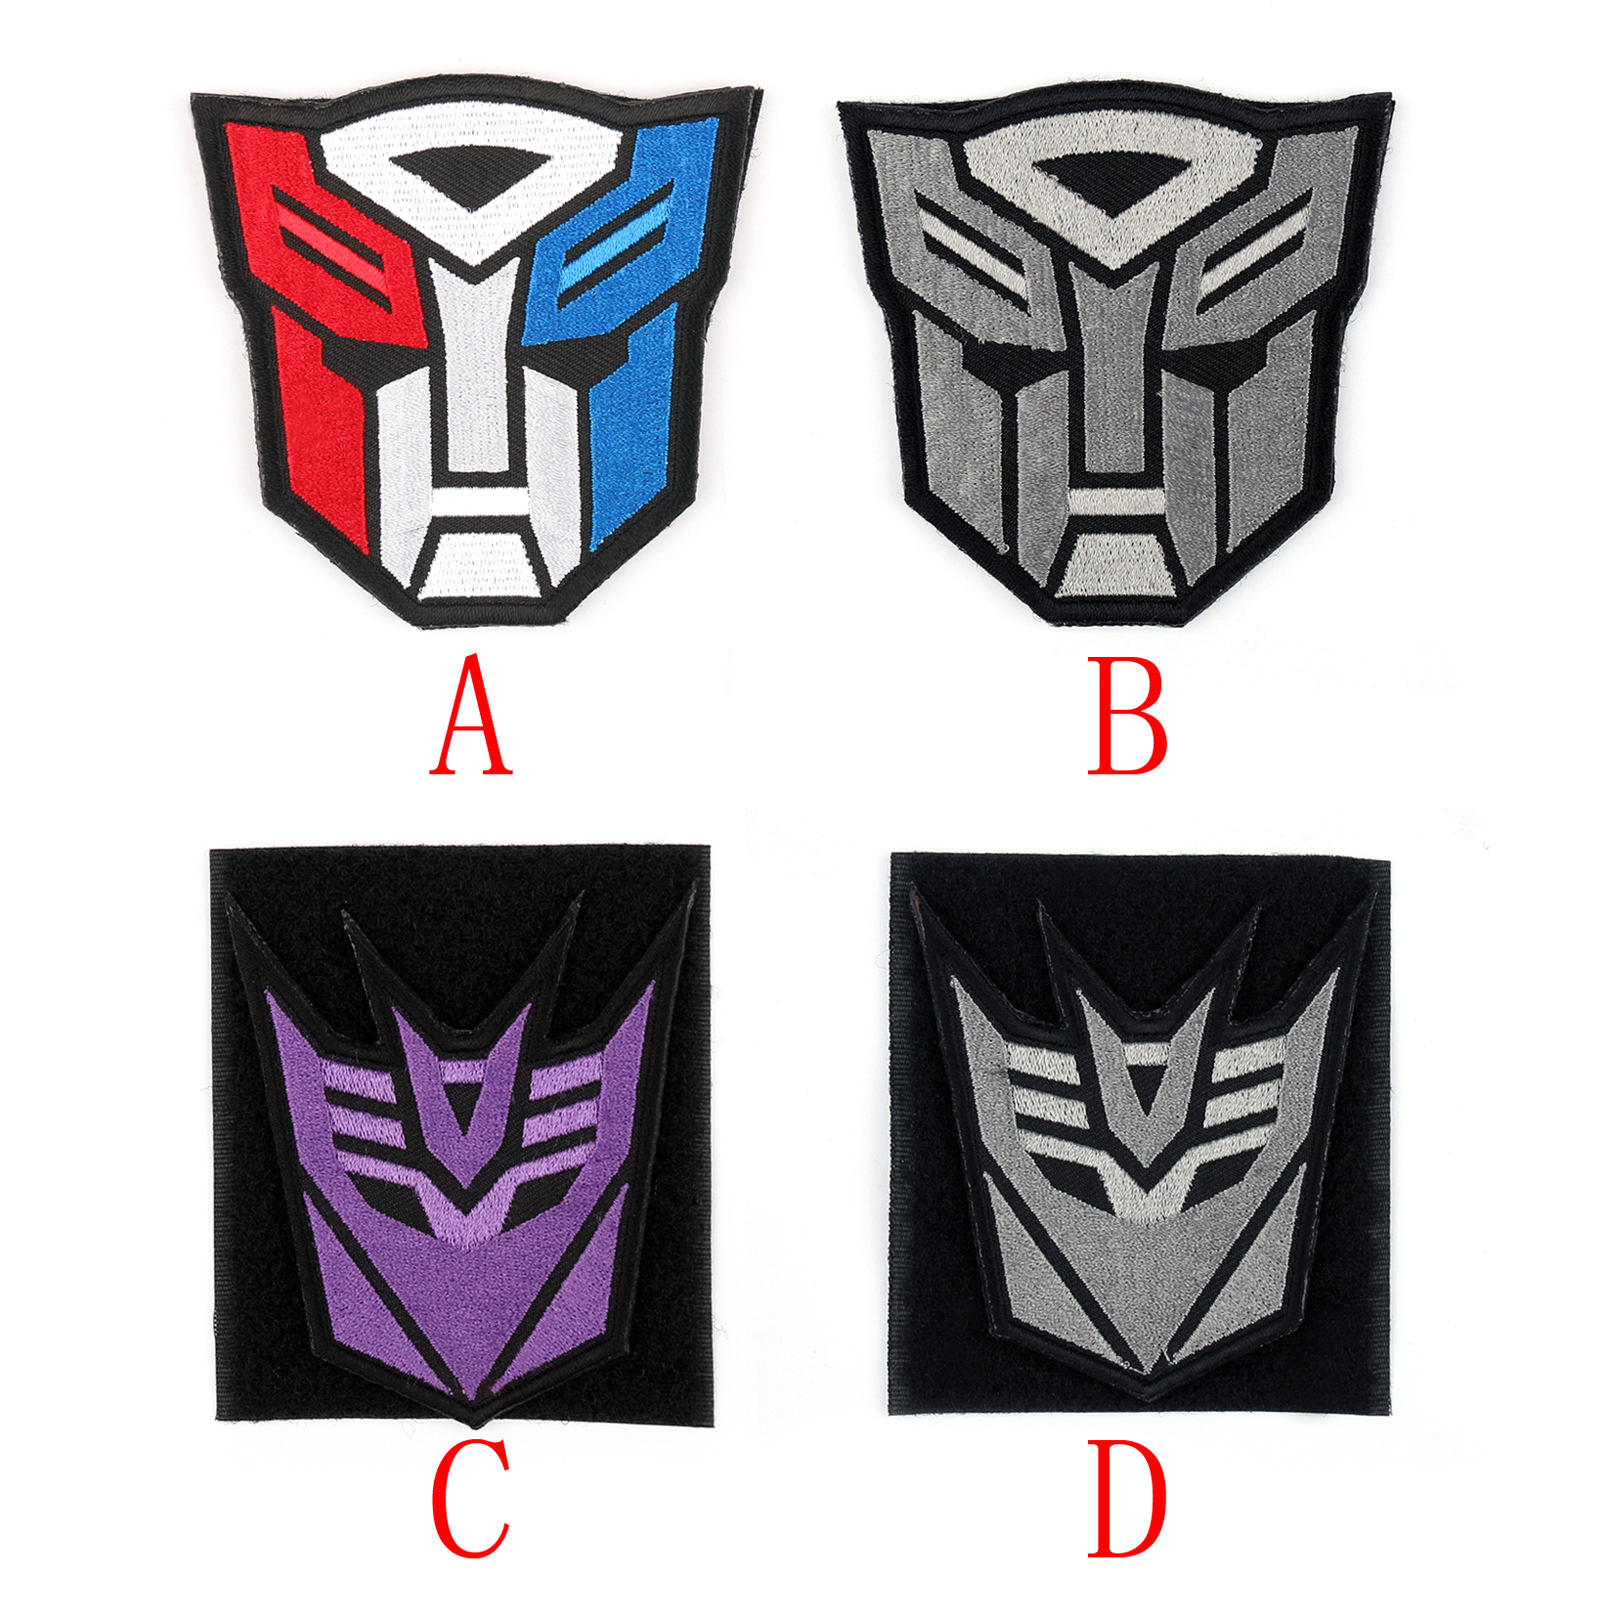 Detalles acerca de Logotipo de Transformers Optimus Prime Autobot  Decepticon Bordar Gancho Bucle Parche ss.